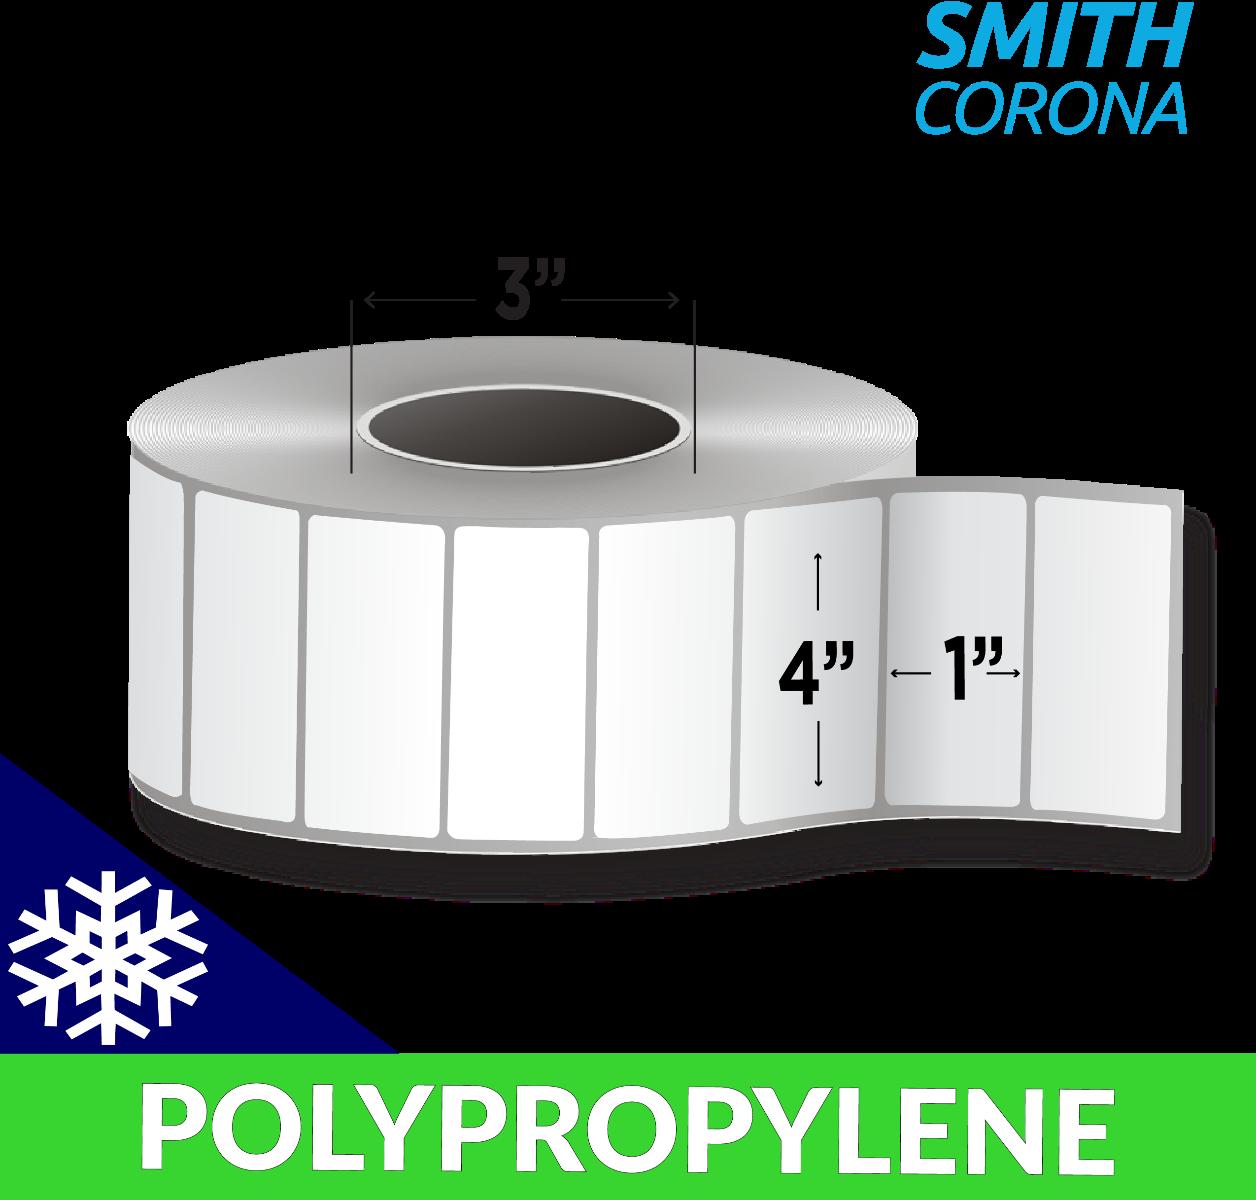 "4"" x 1"" Polypropylene (Freezer Grade) - Thermal Transfer Labels - 3"" Core"